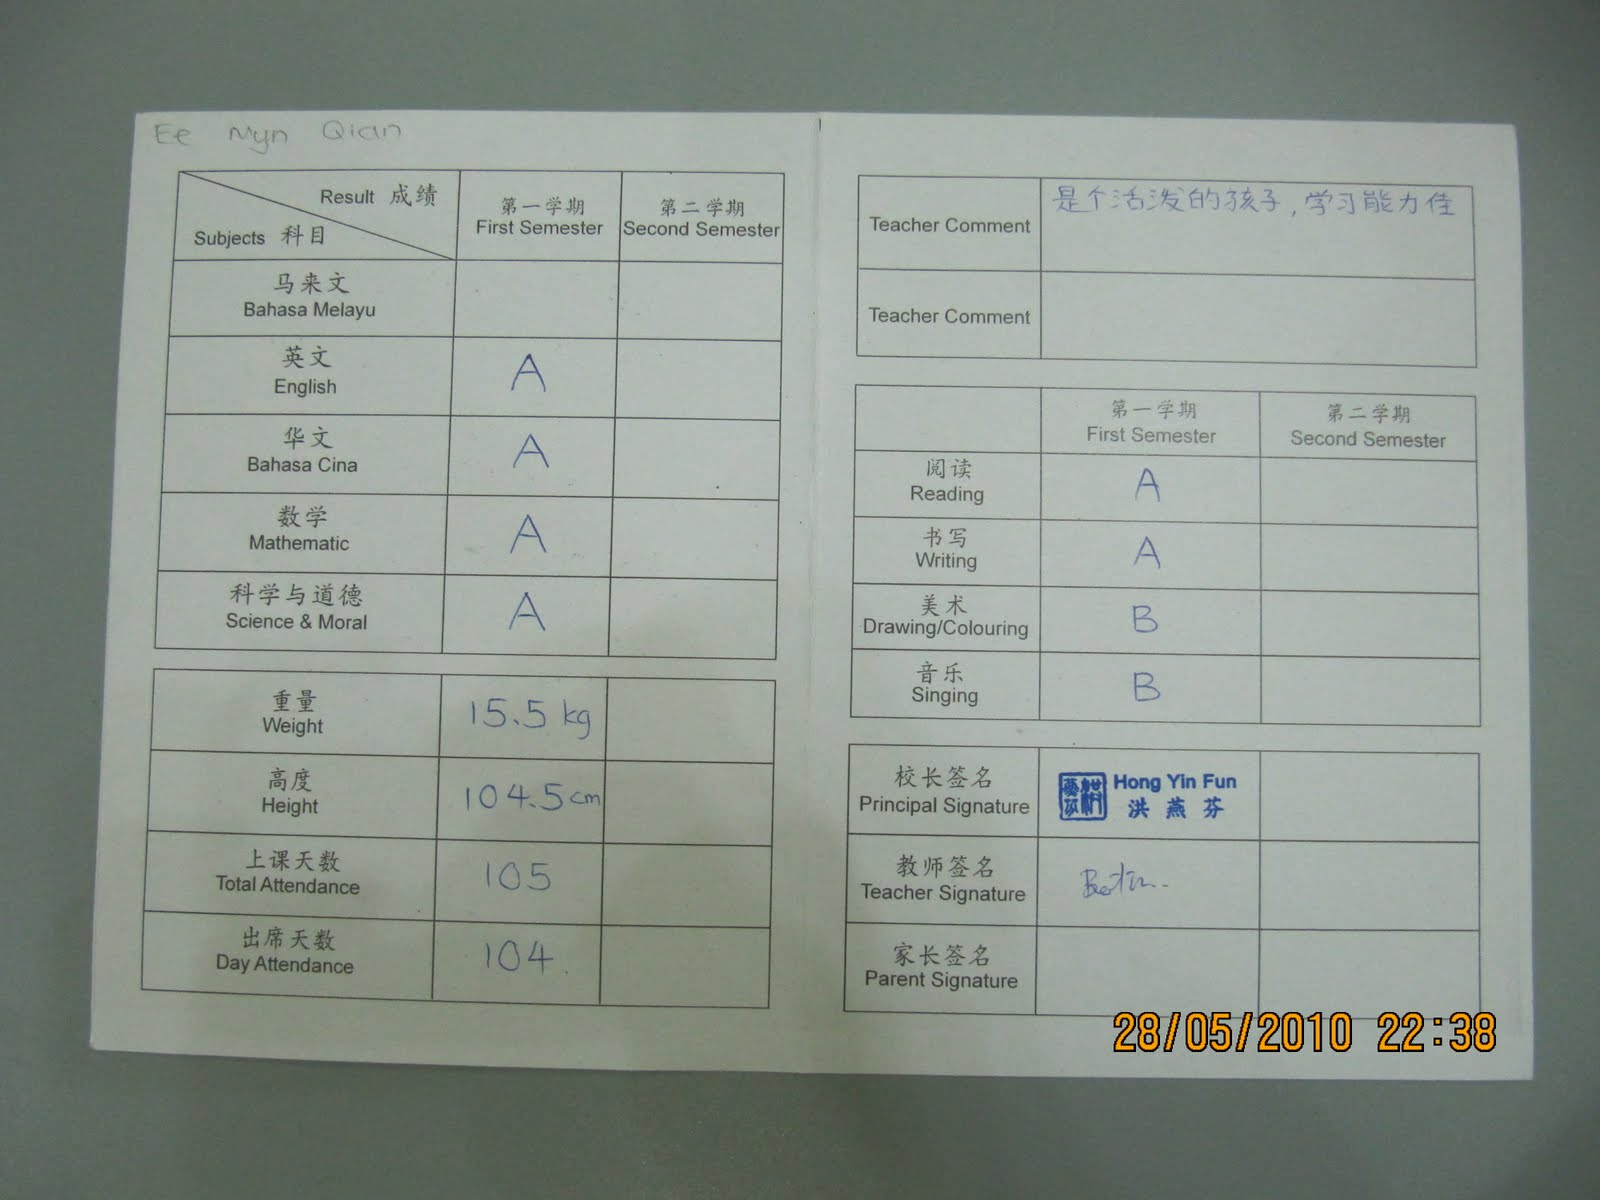 Utm thesis quantity surveying picture 2